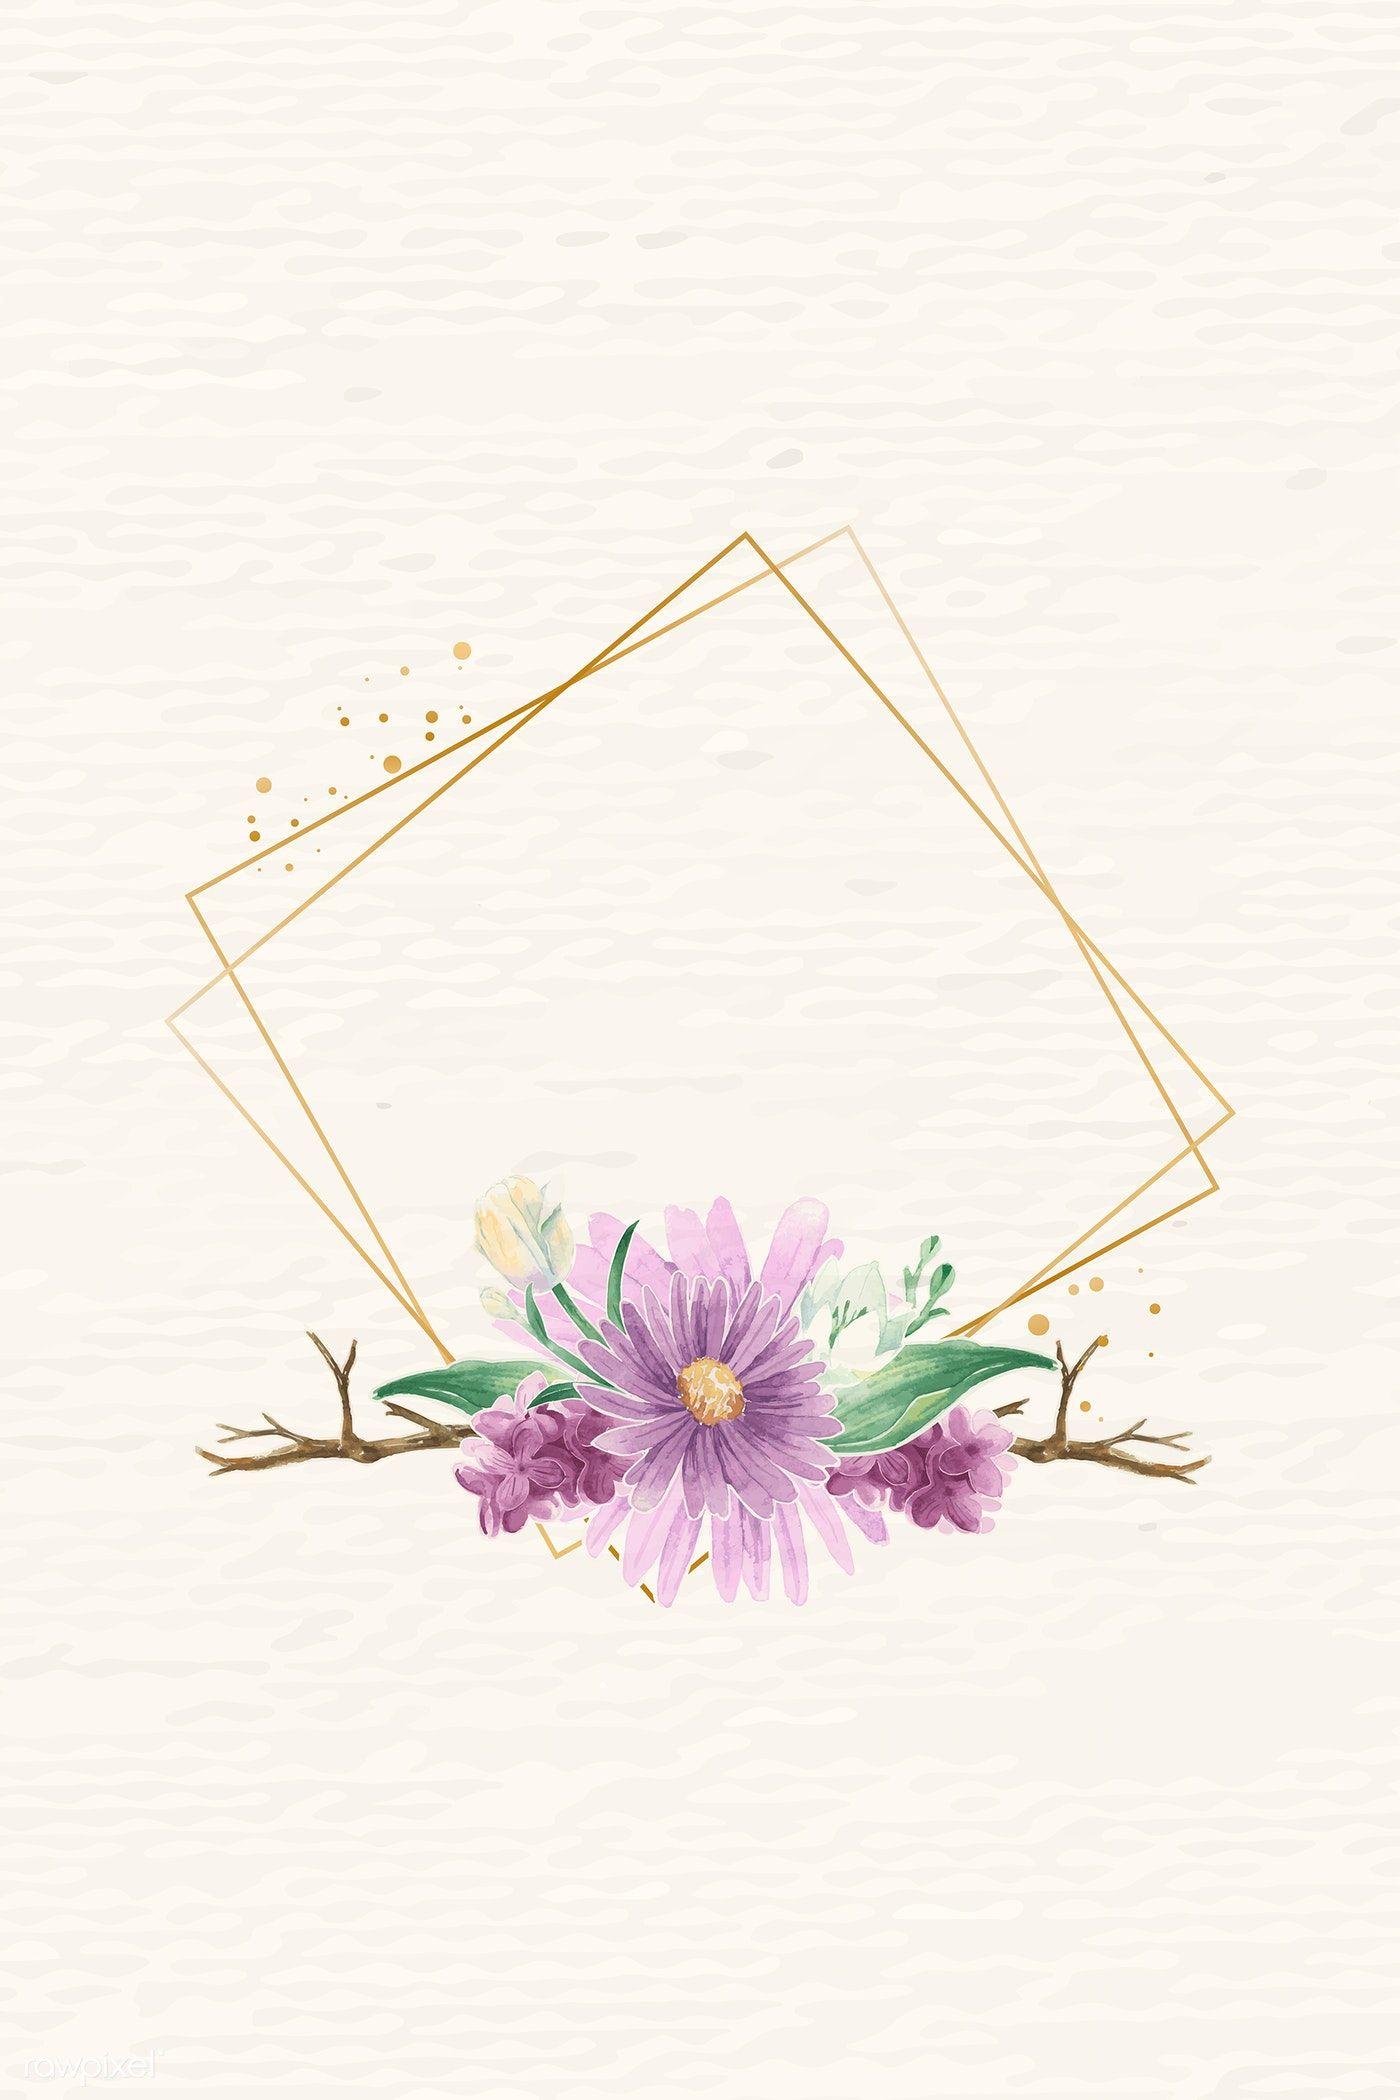 Download premium vector of Rhombus gold flower frame